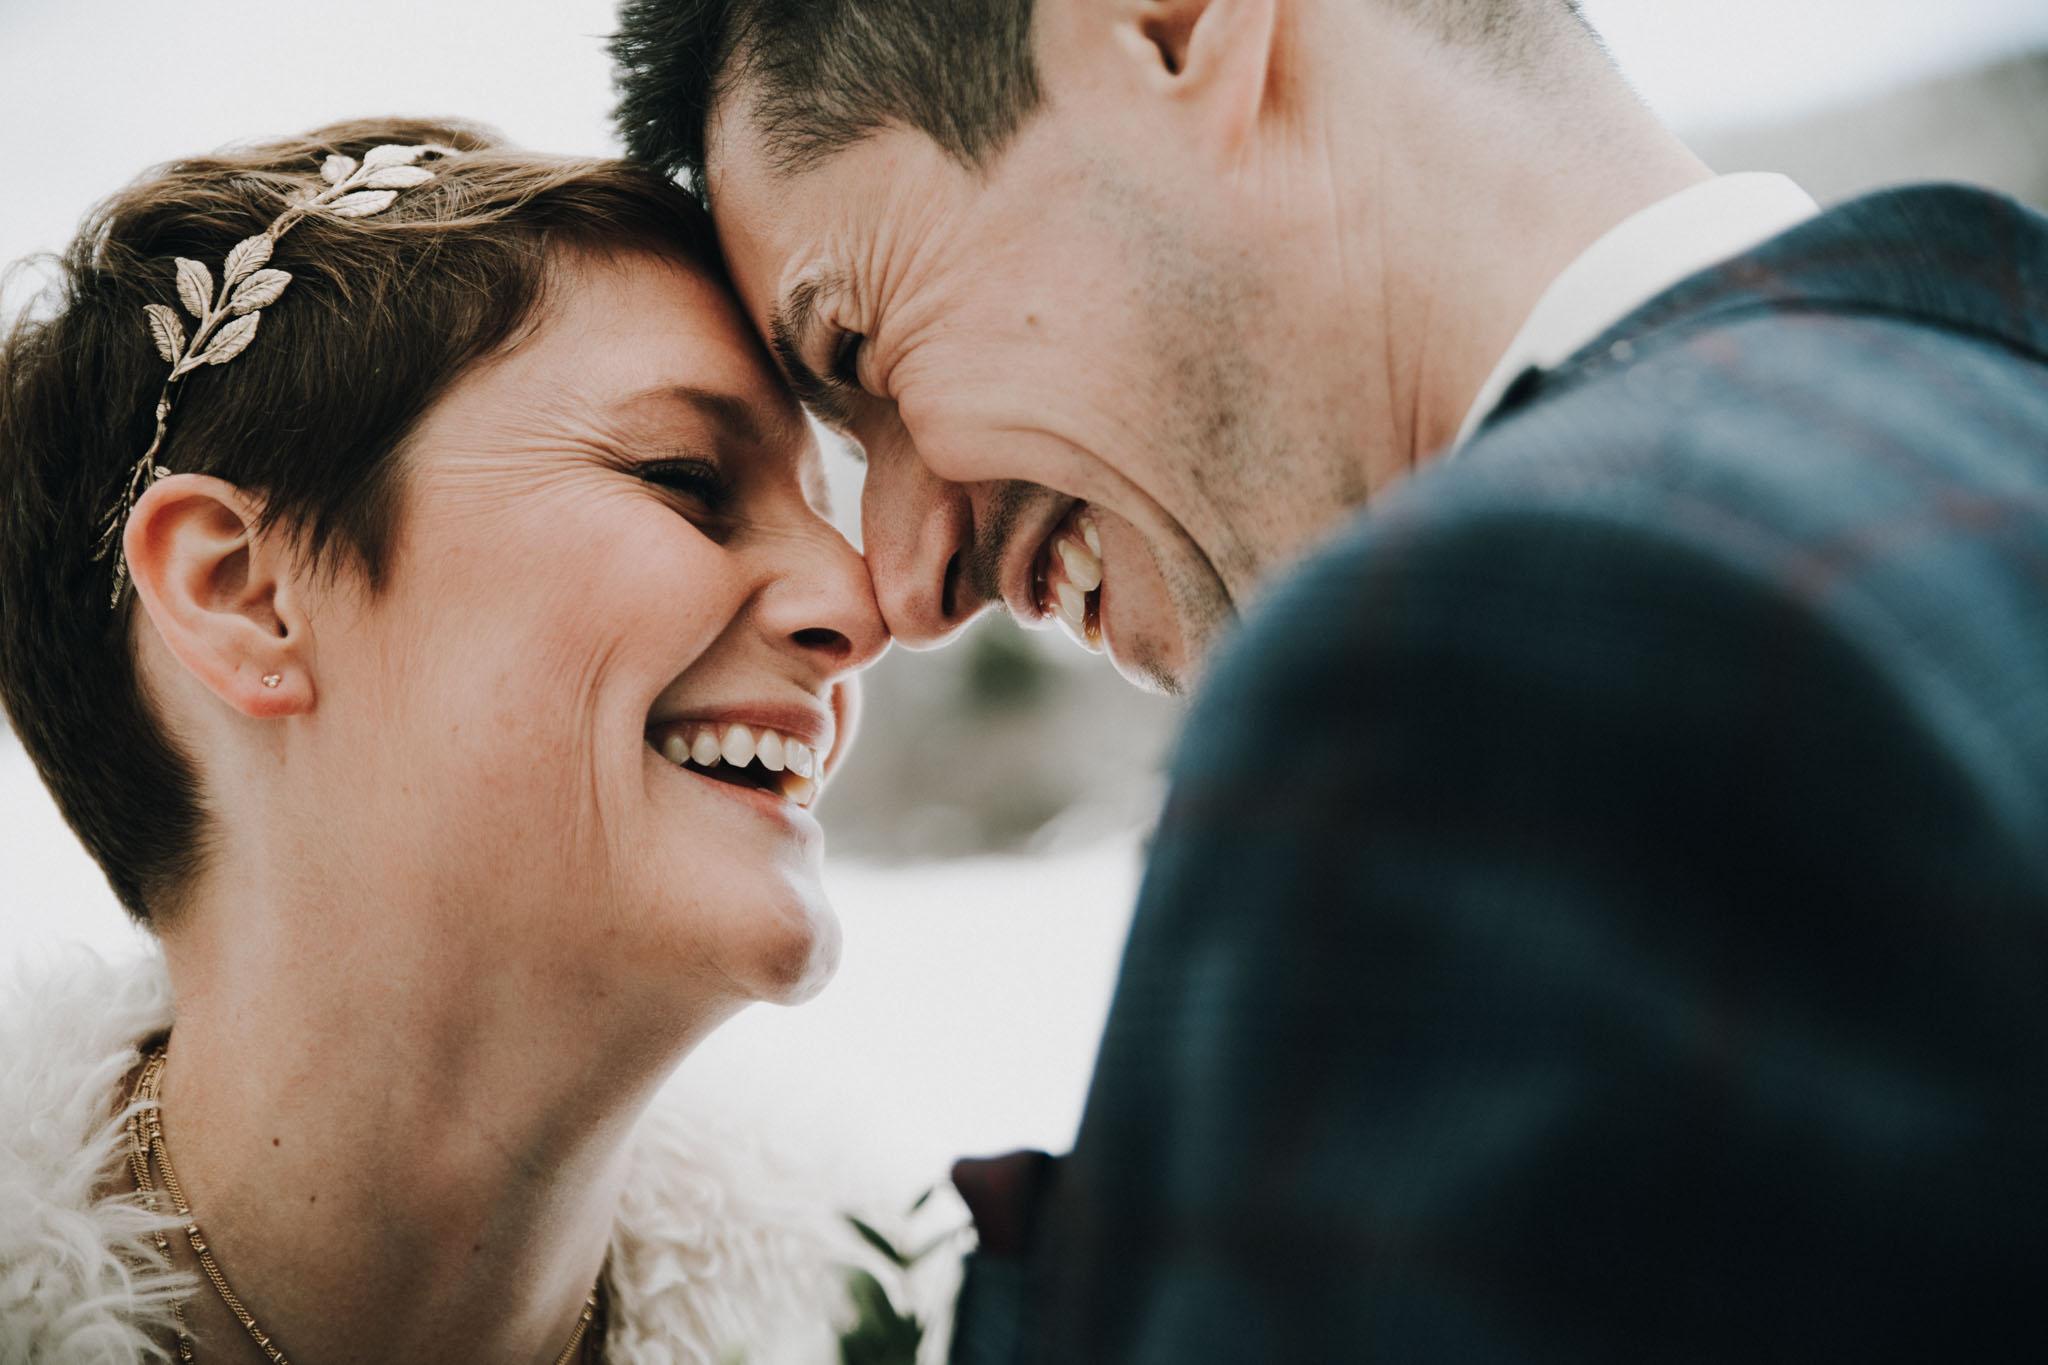 2018-02-03 - LD8_4638 - photographe - mariage - www.lauriediazwedding.com.jpg